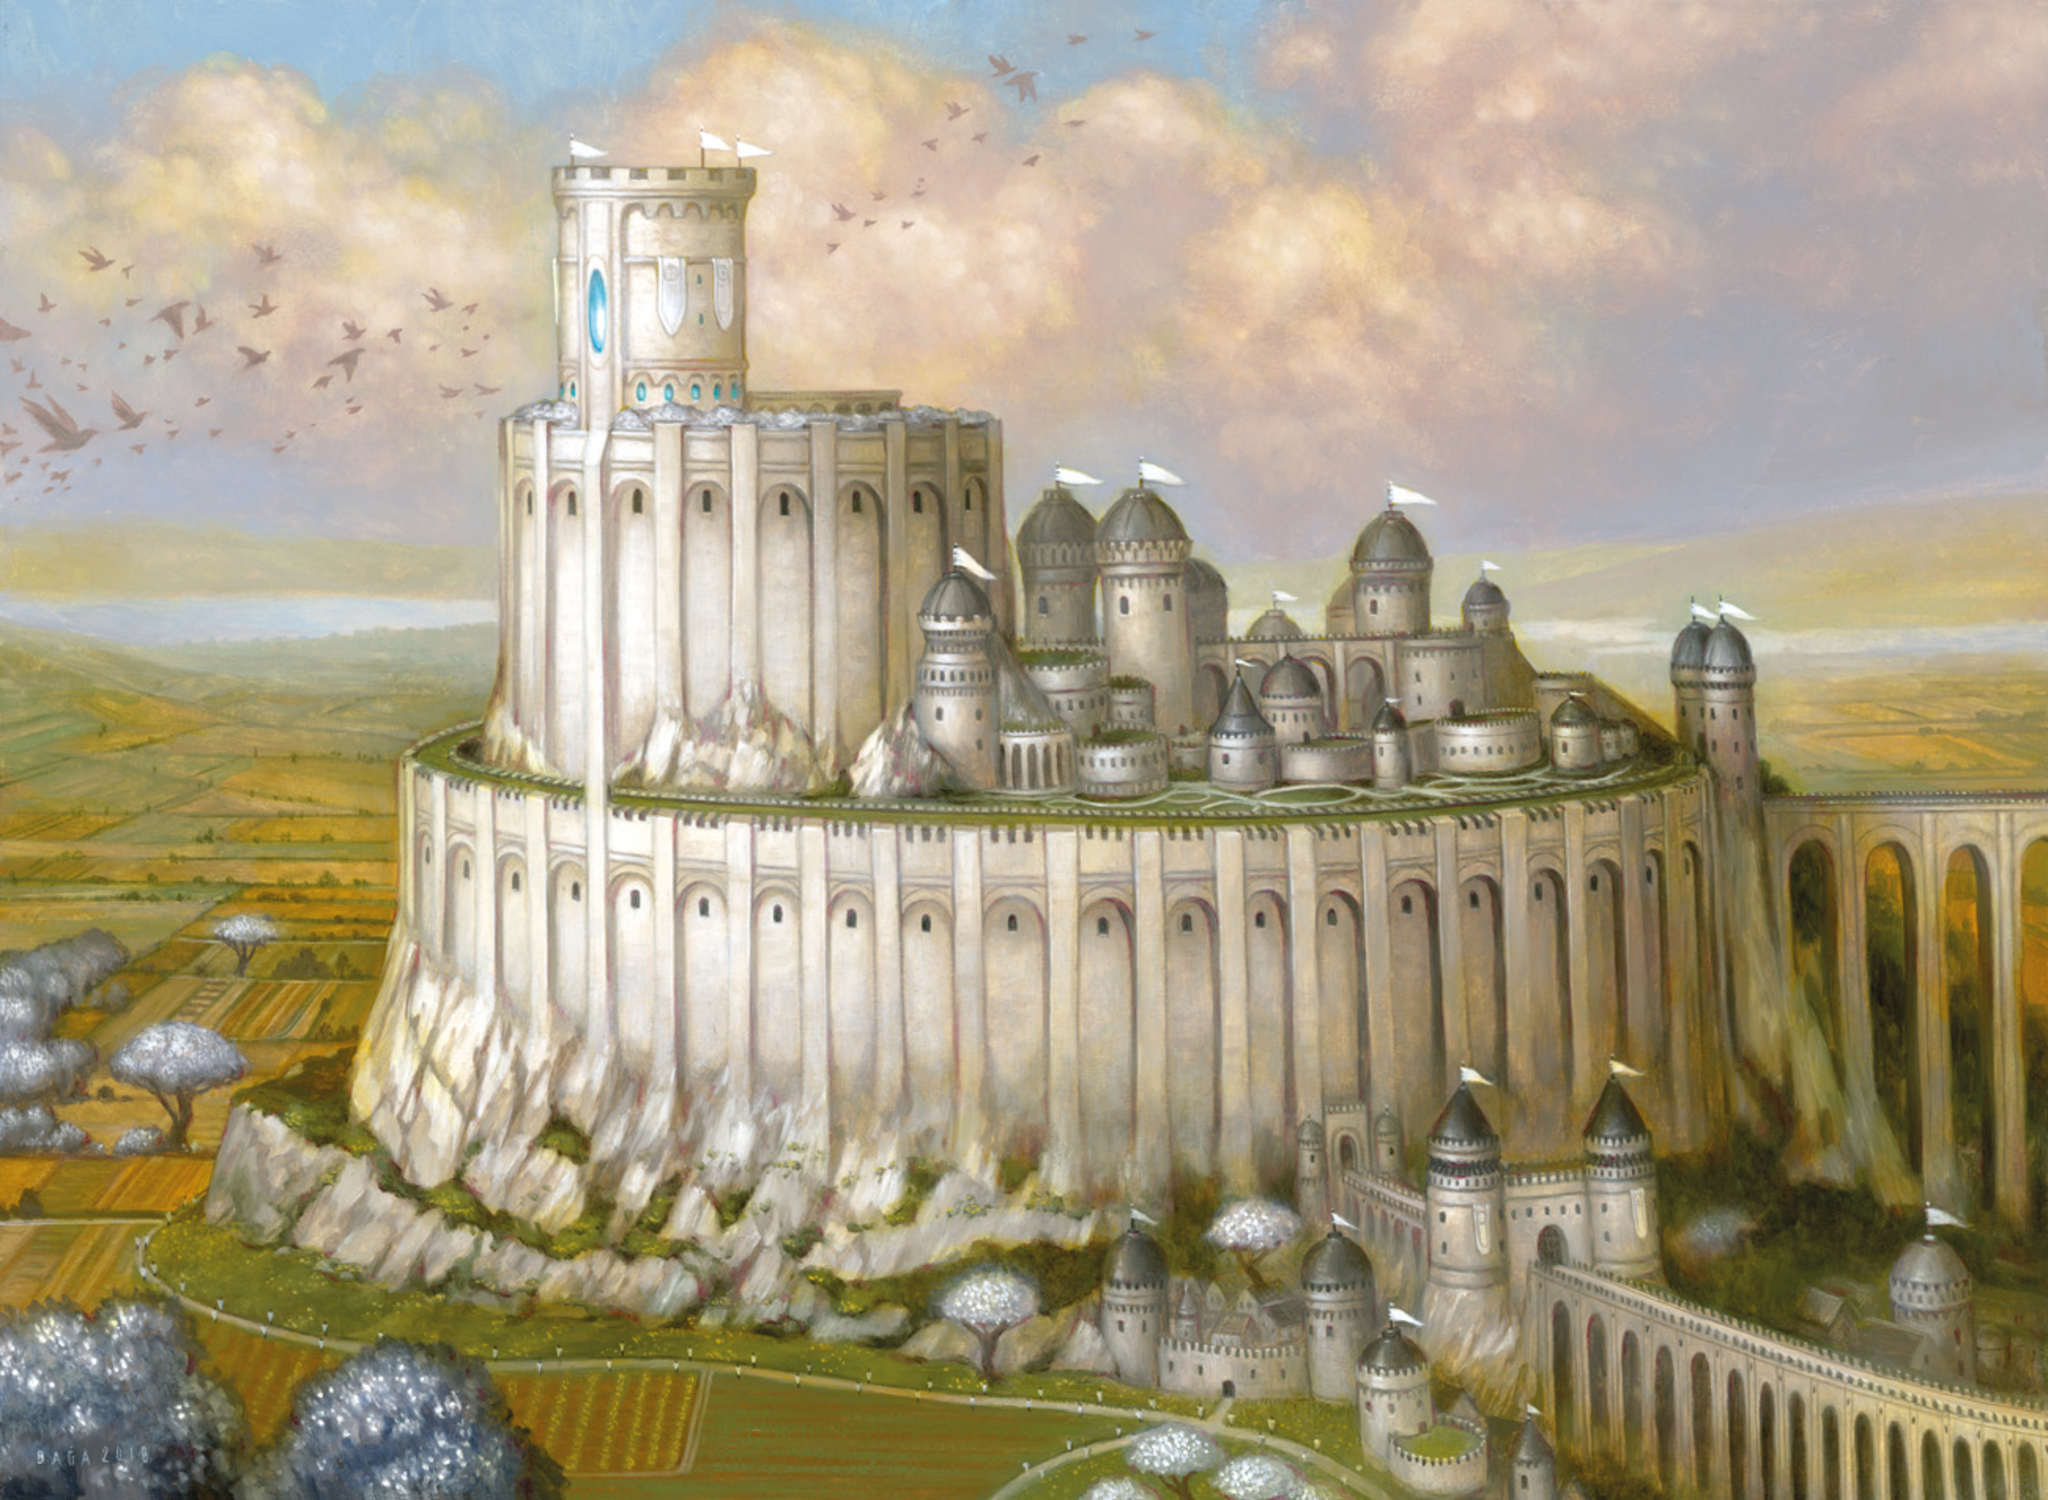 Castle Ardenvale Artwork by Volkan Baga